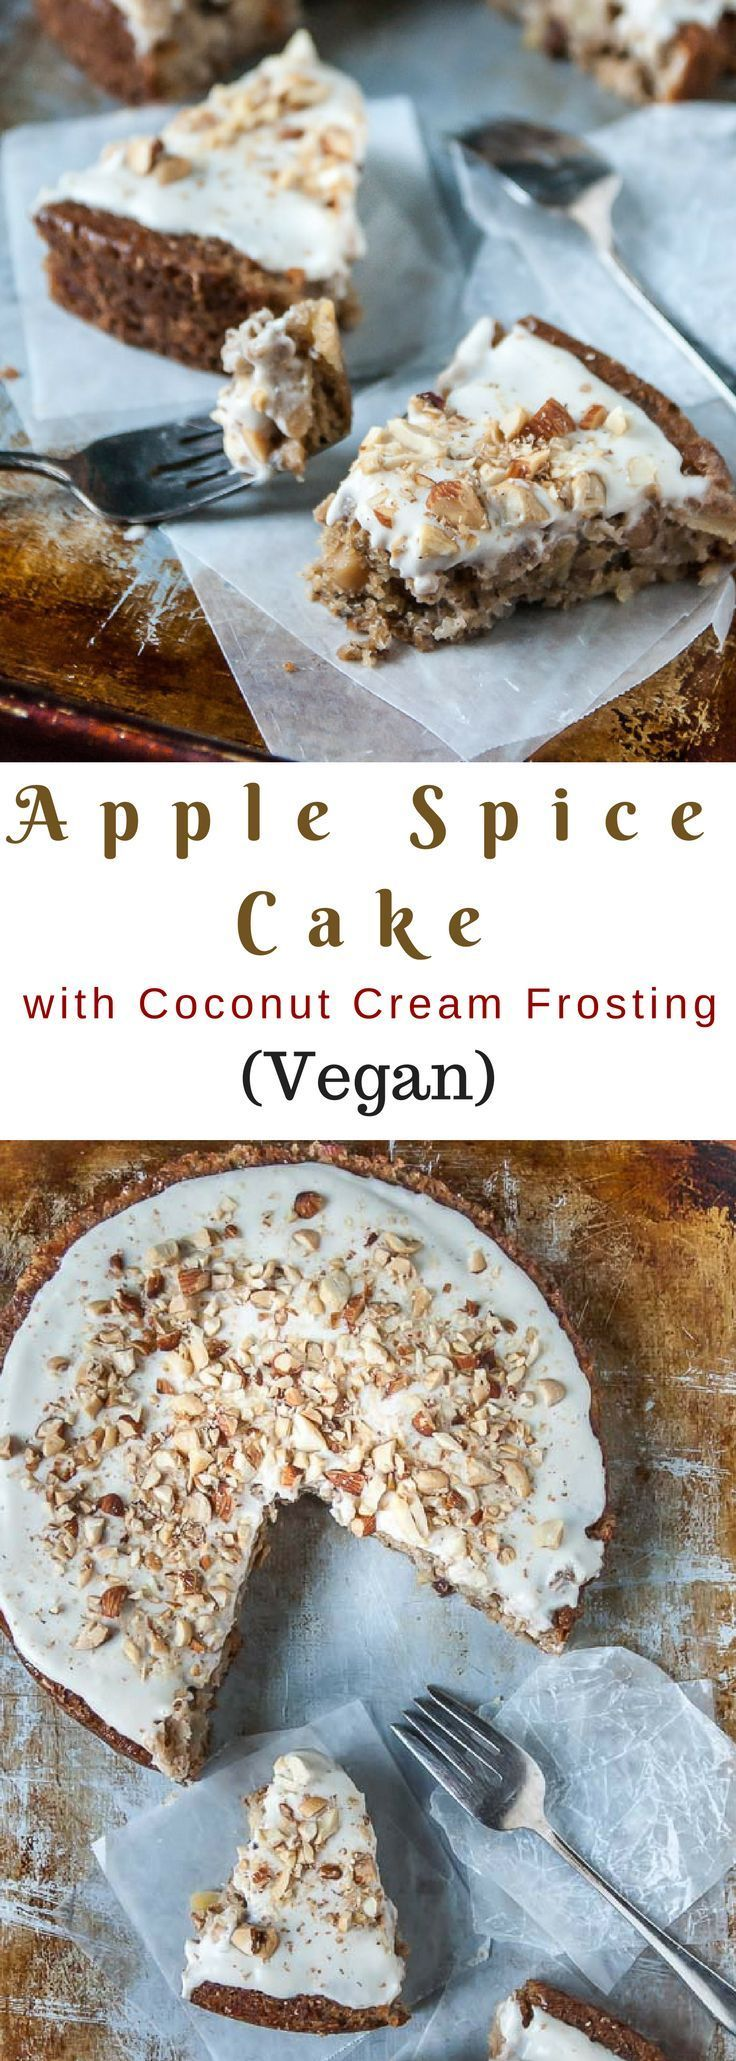 Sugar free apple spice cake recipe